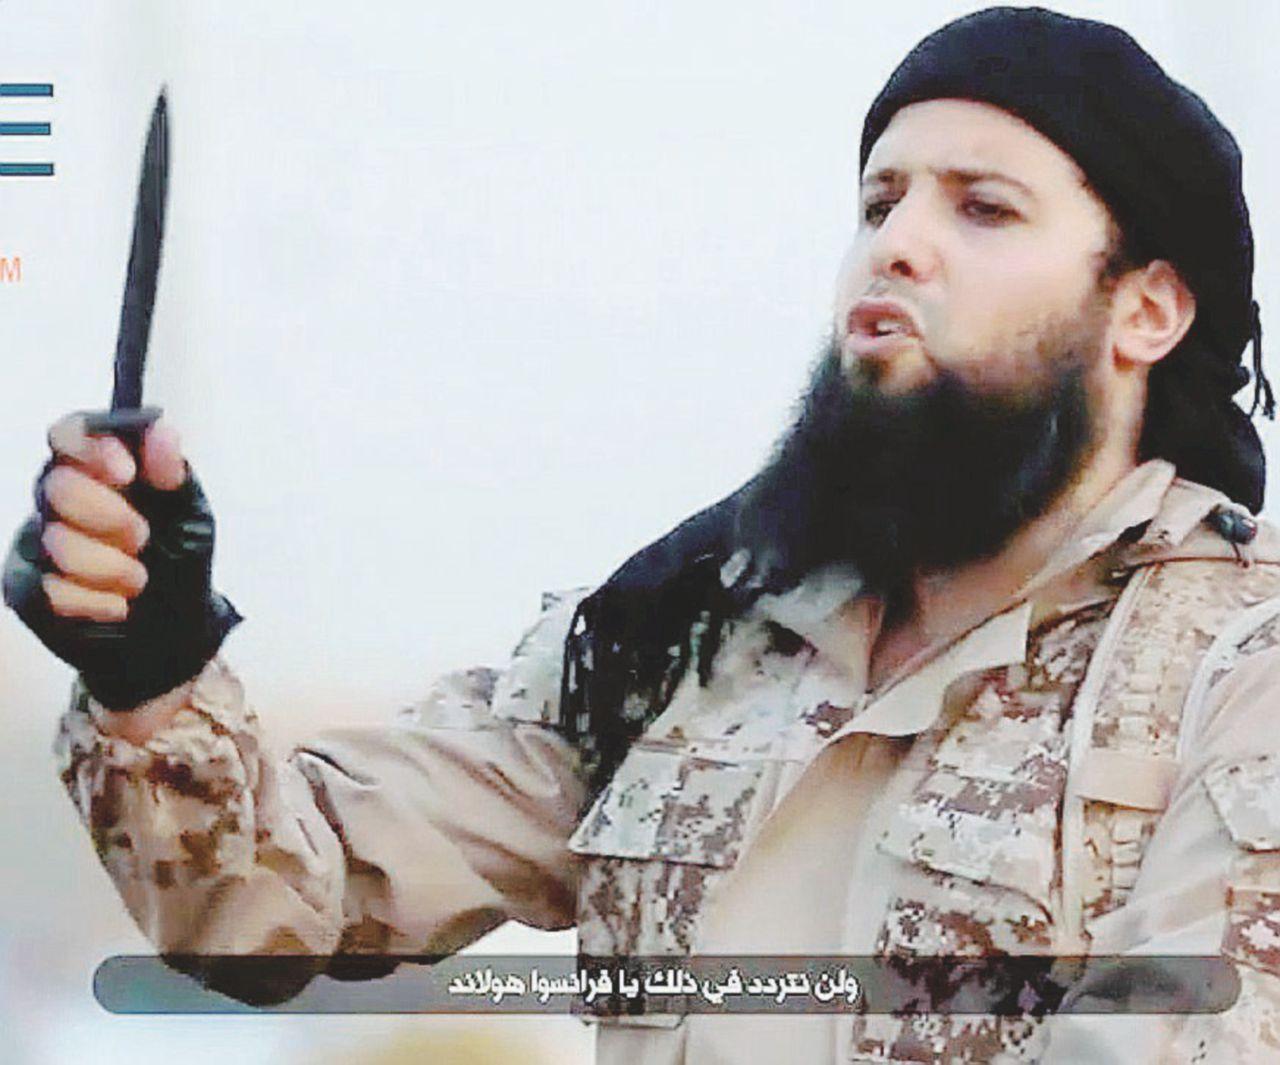 Tre baby jihadisti arruolati dall'ex rapper sui social